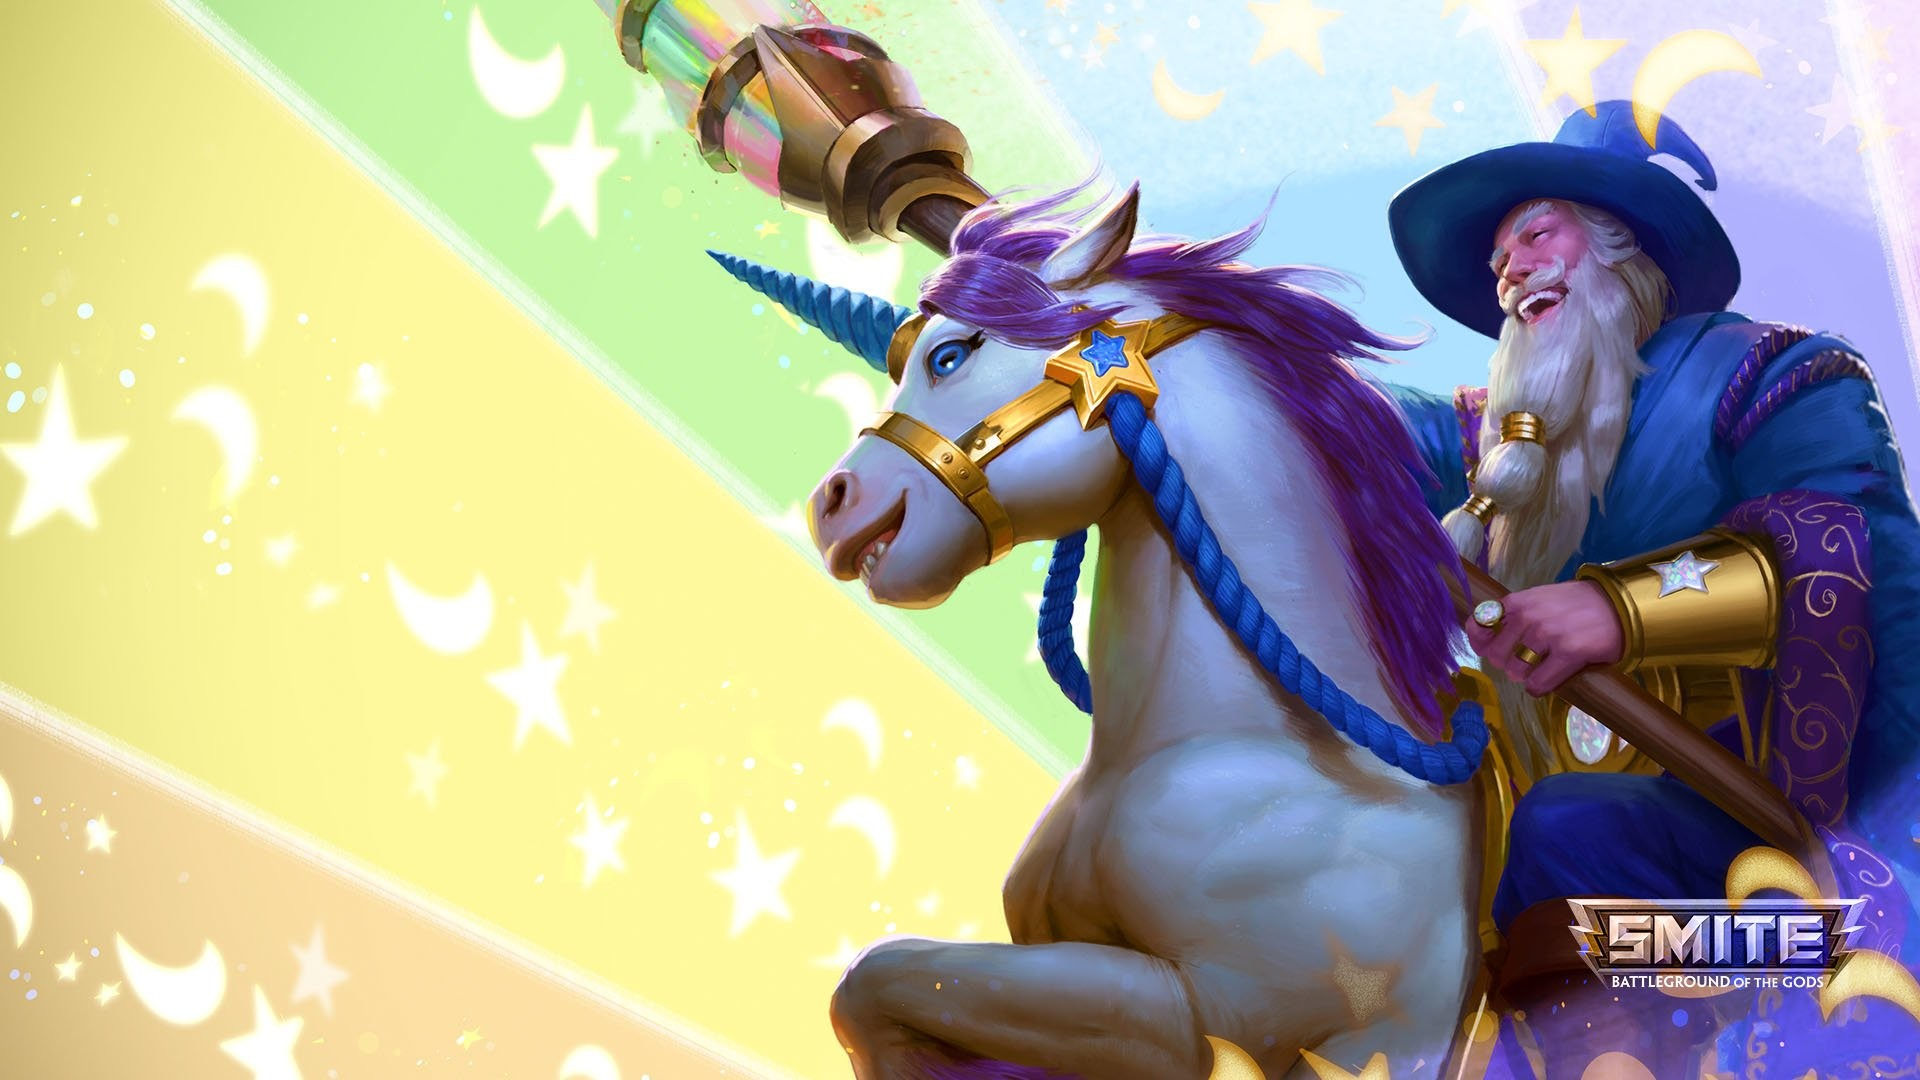 Video Game – Smite Video Game Guan Yu (Smite) Bakgrund